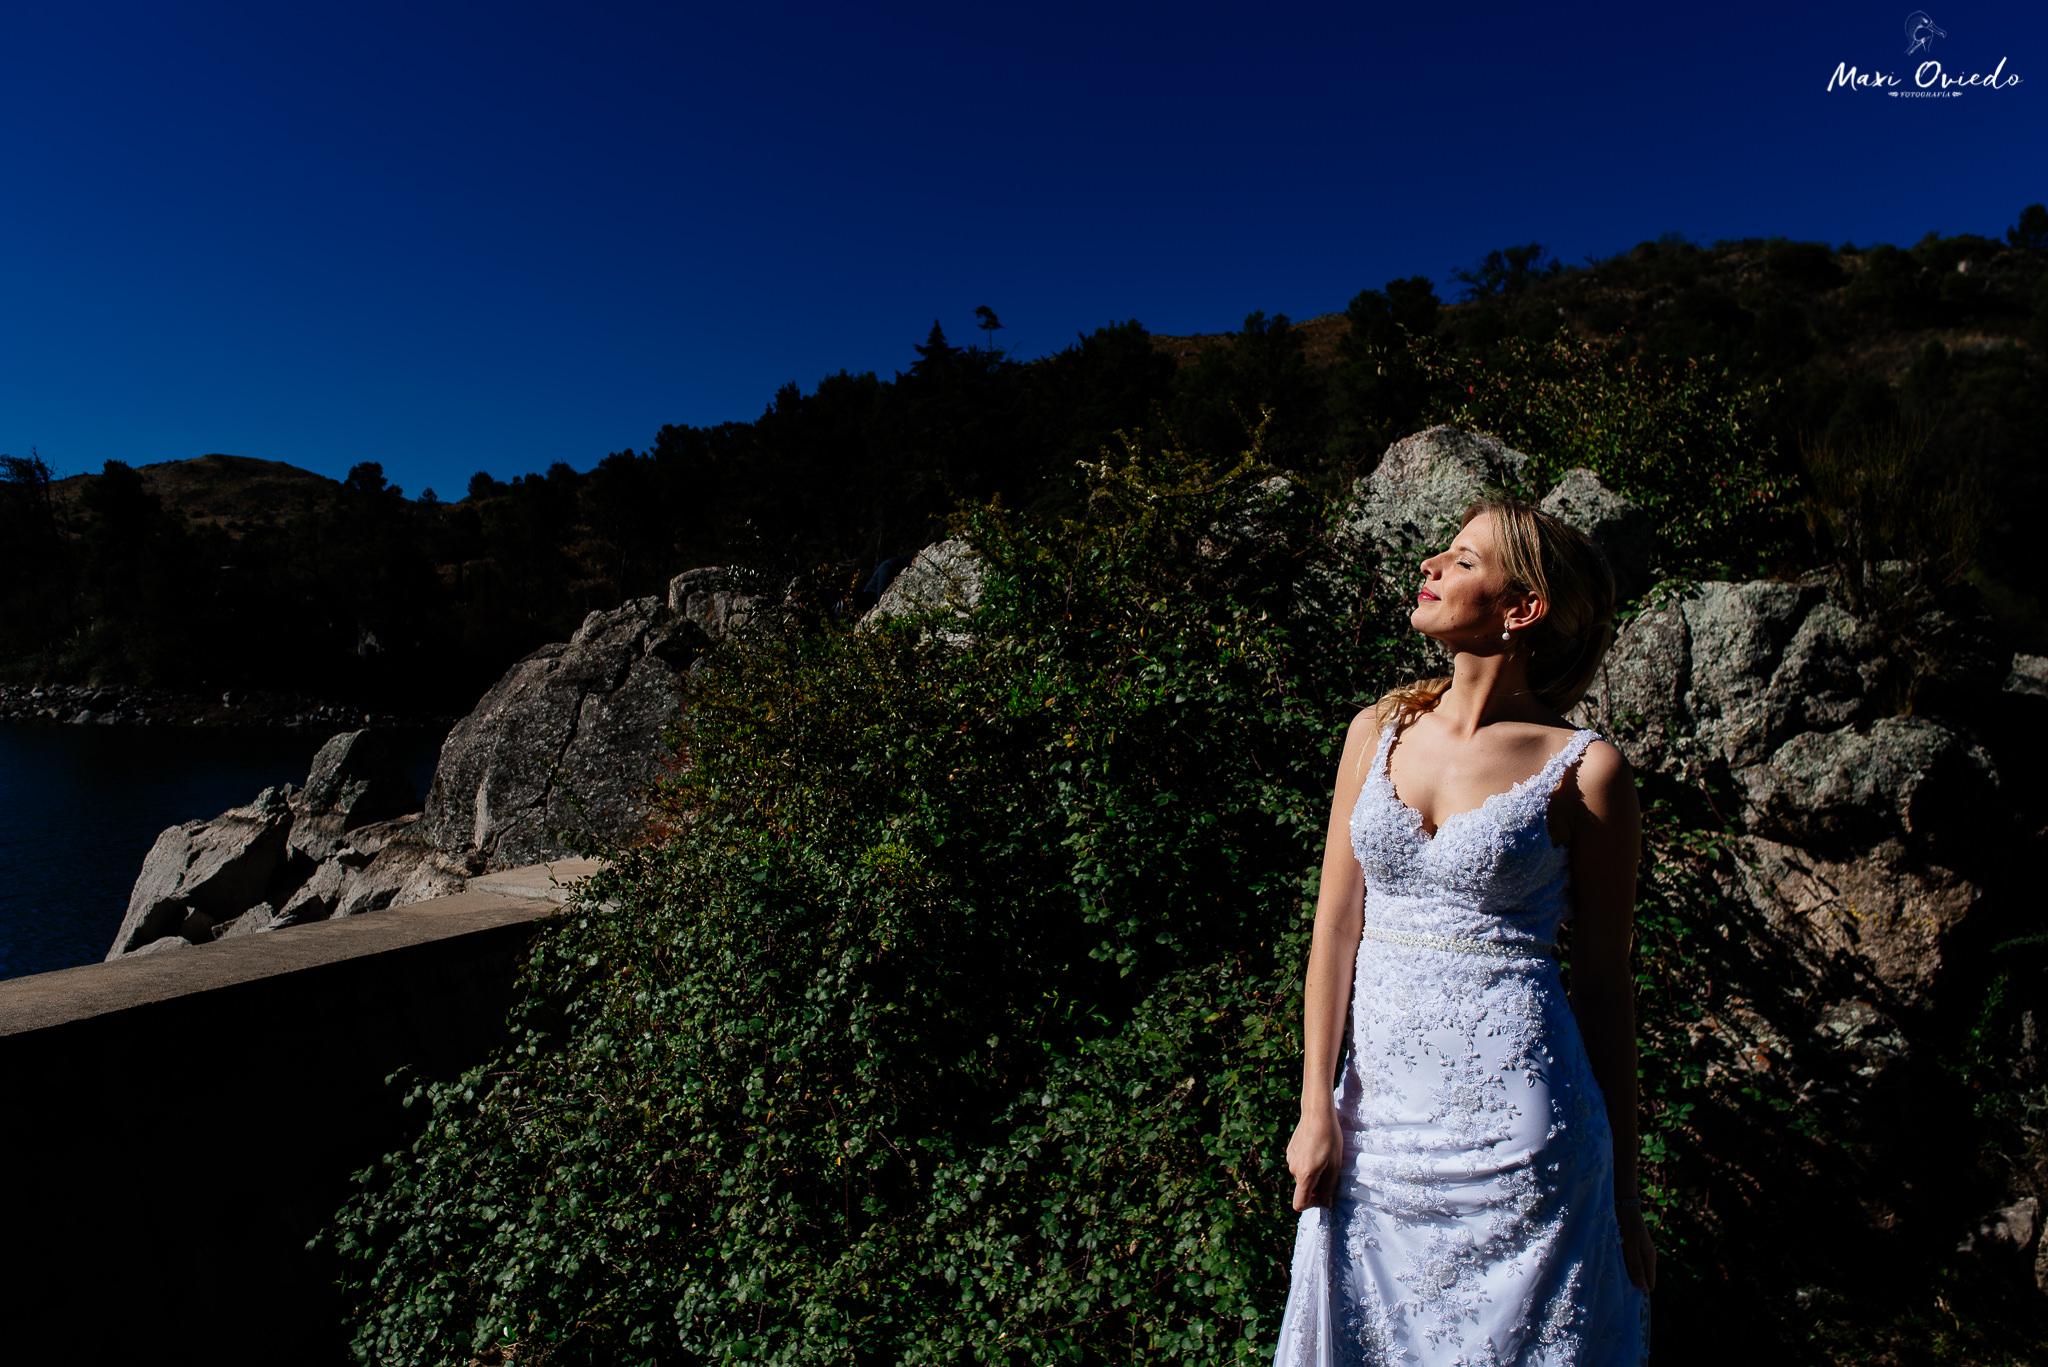 boda sextuple la cumbre cordoba cuchi corral fotografo de bodas fotografo de casamientos rosario san nicolas argentina vestido de novia ramo de novia-6.jpg